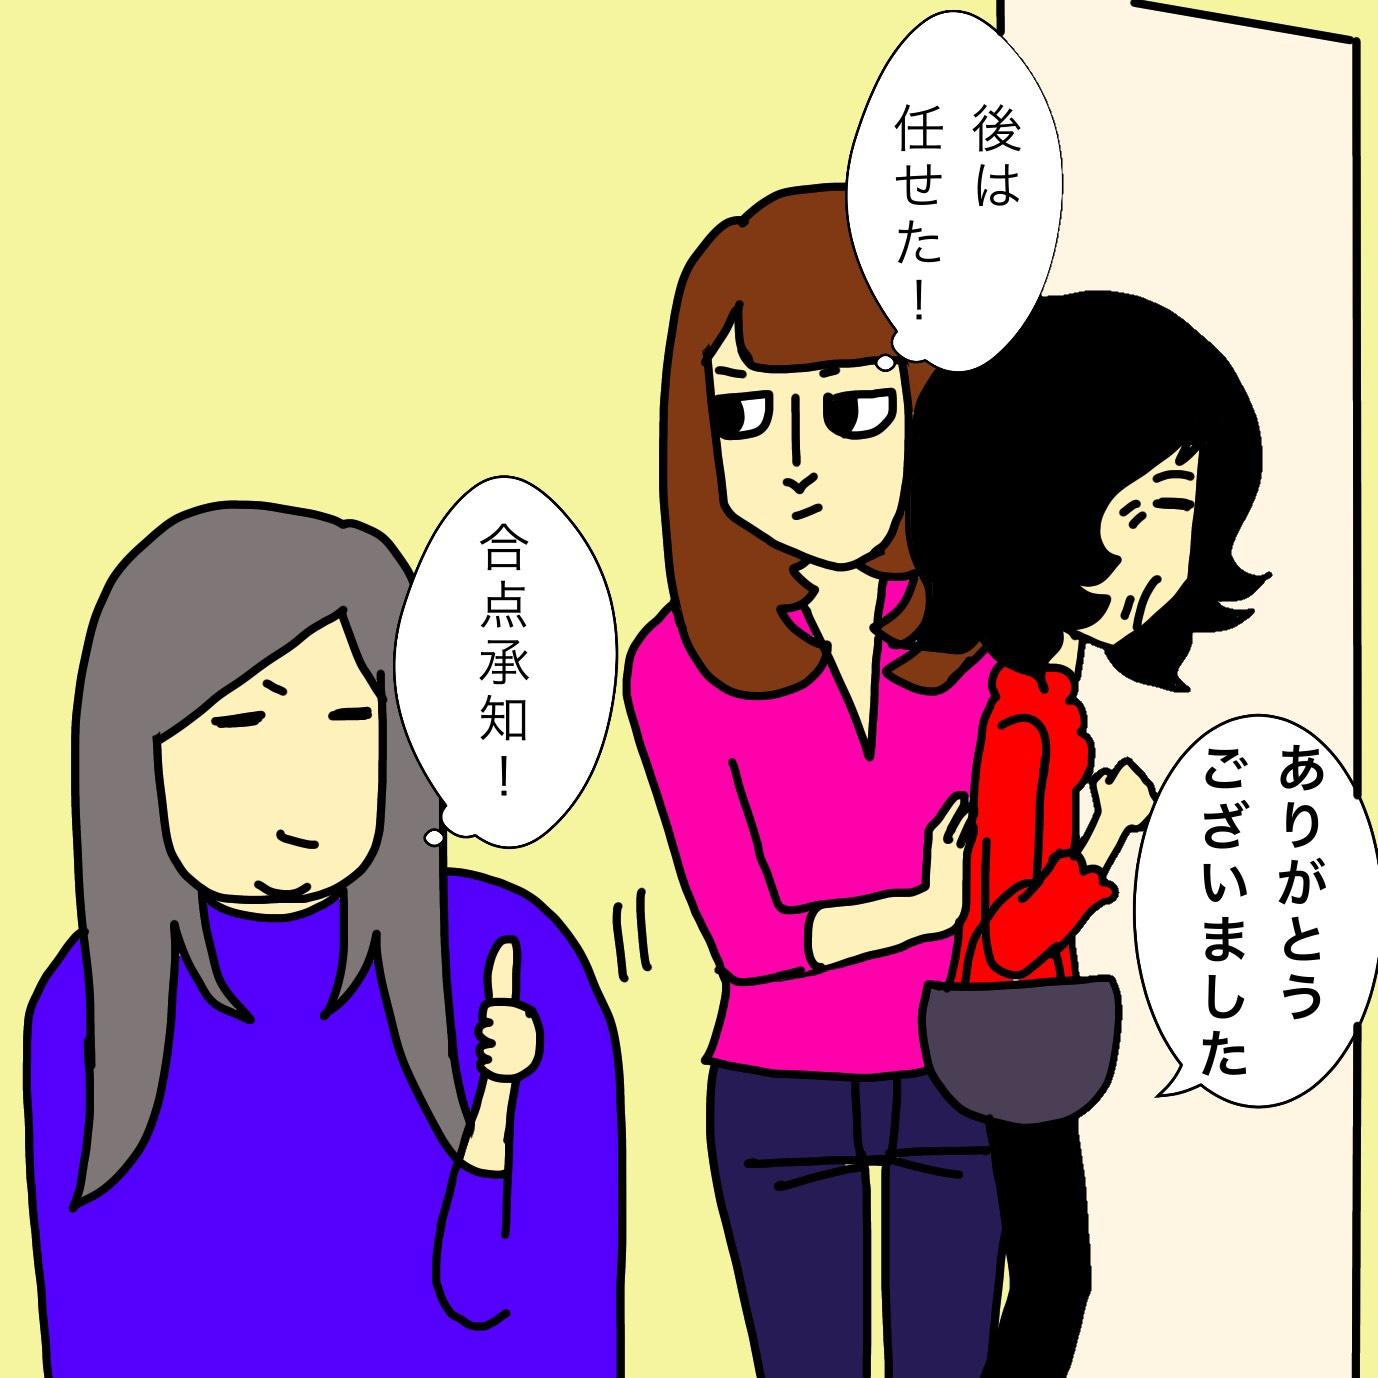 Image-15.jpeg